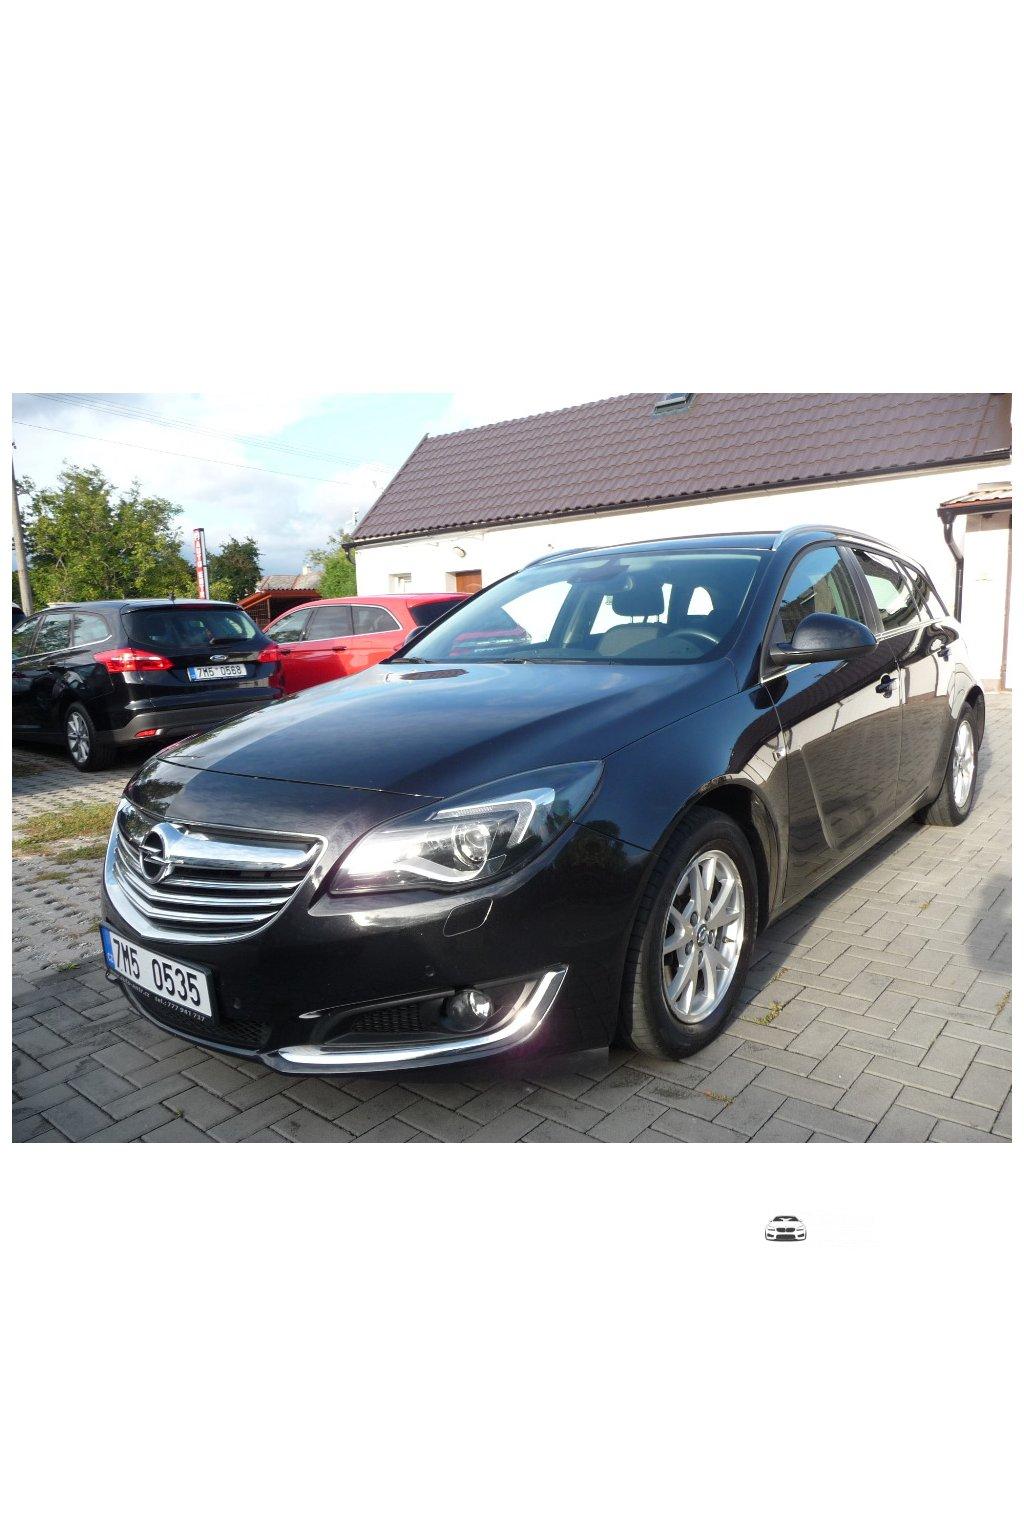 Opel Insignia 2.0 CDTi 103kW Sports navigace bixenony